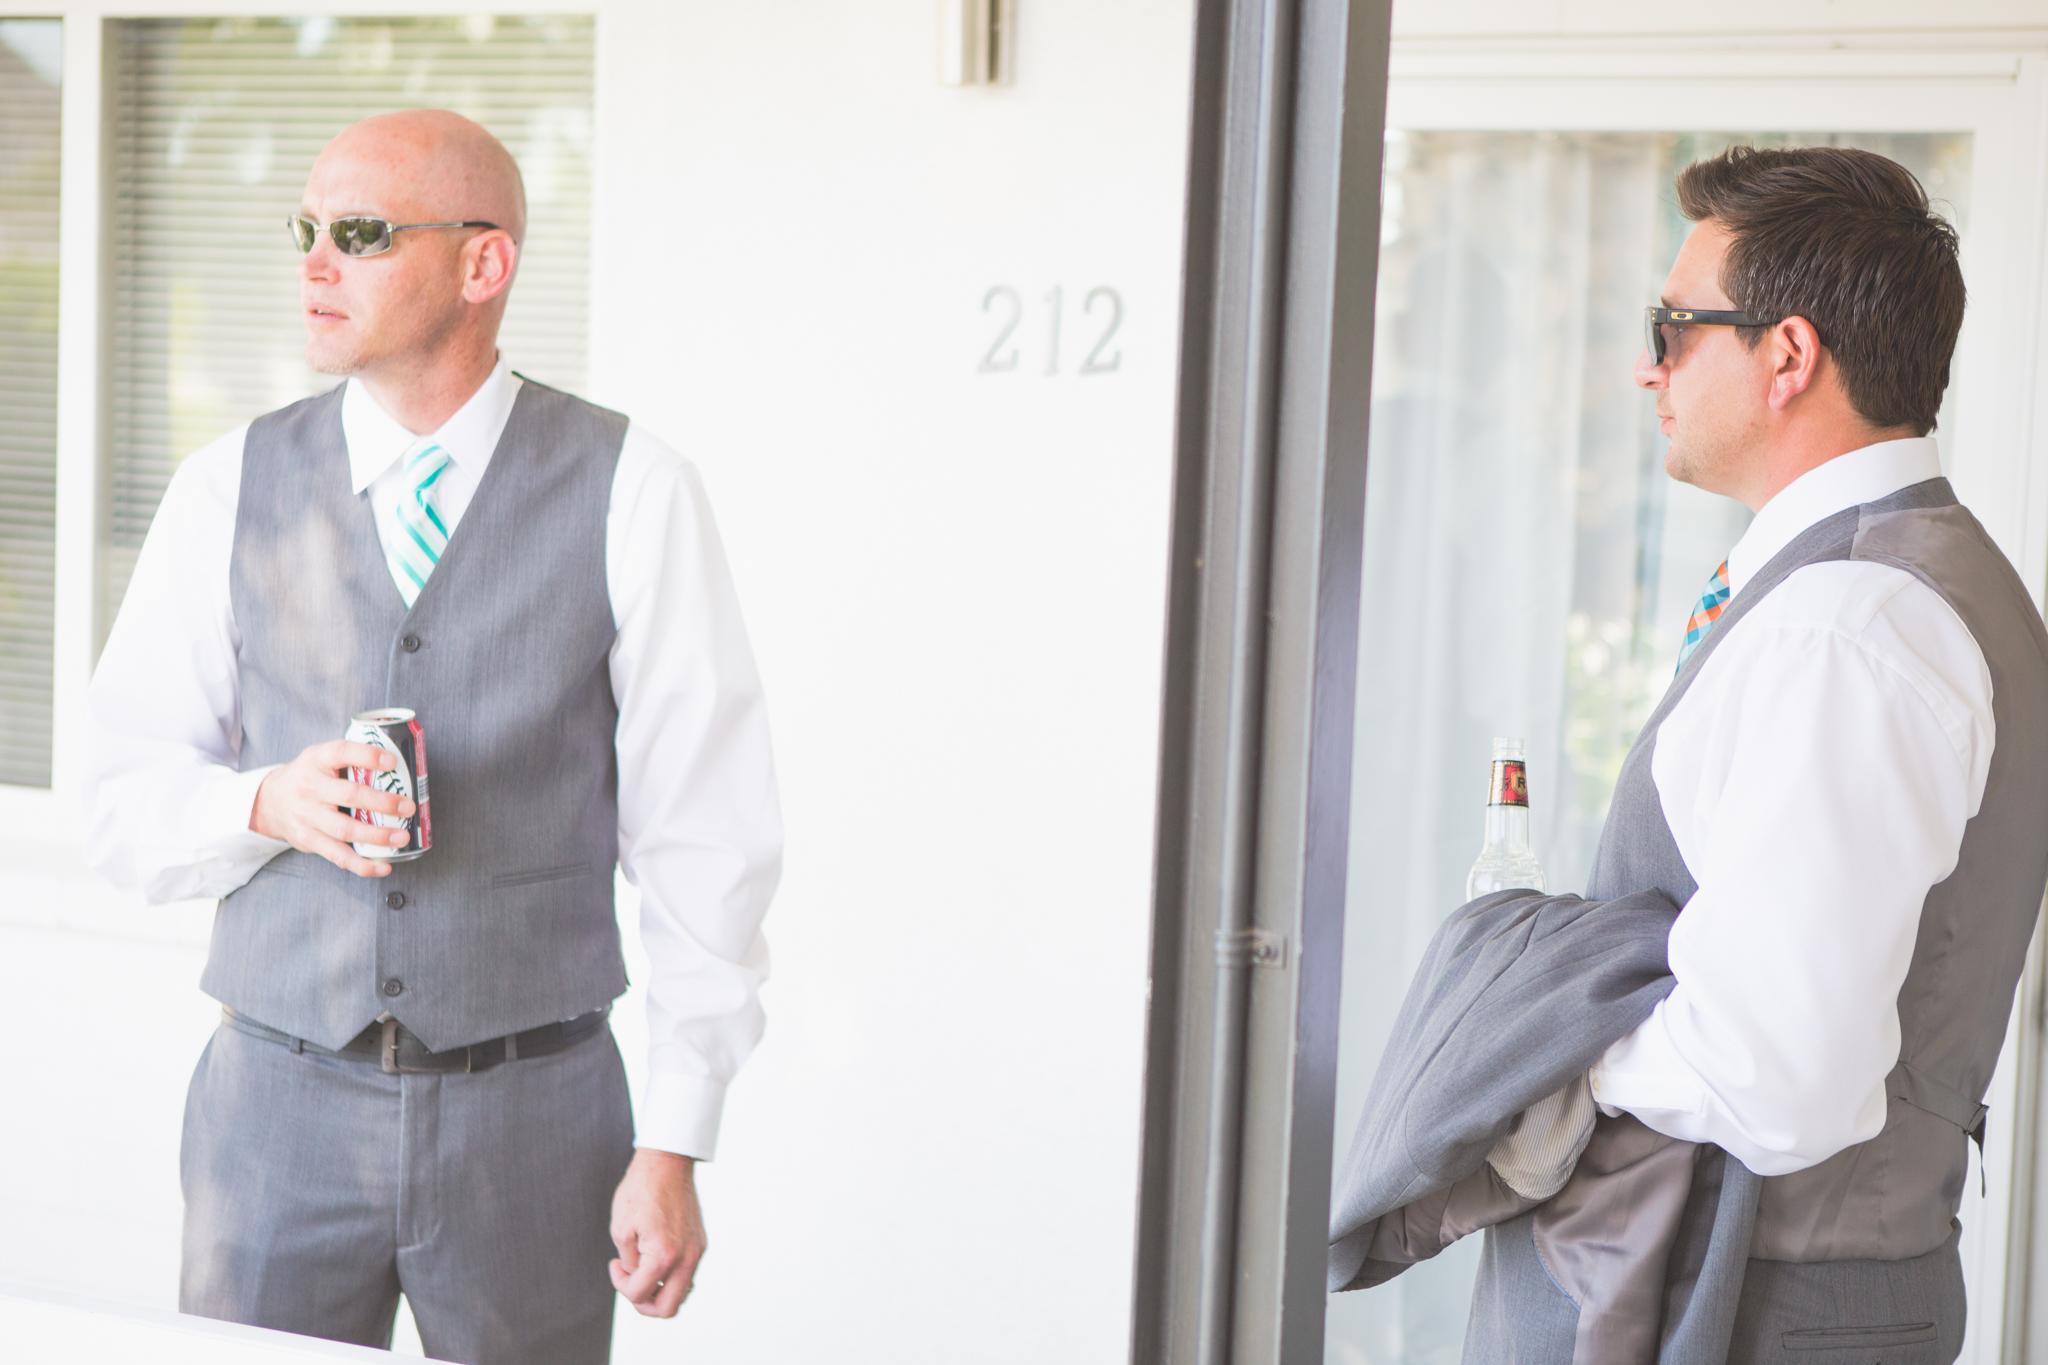 scottsdale-wedding-photographer-el-dorado-groom-groomsman-hanging-out